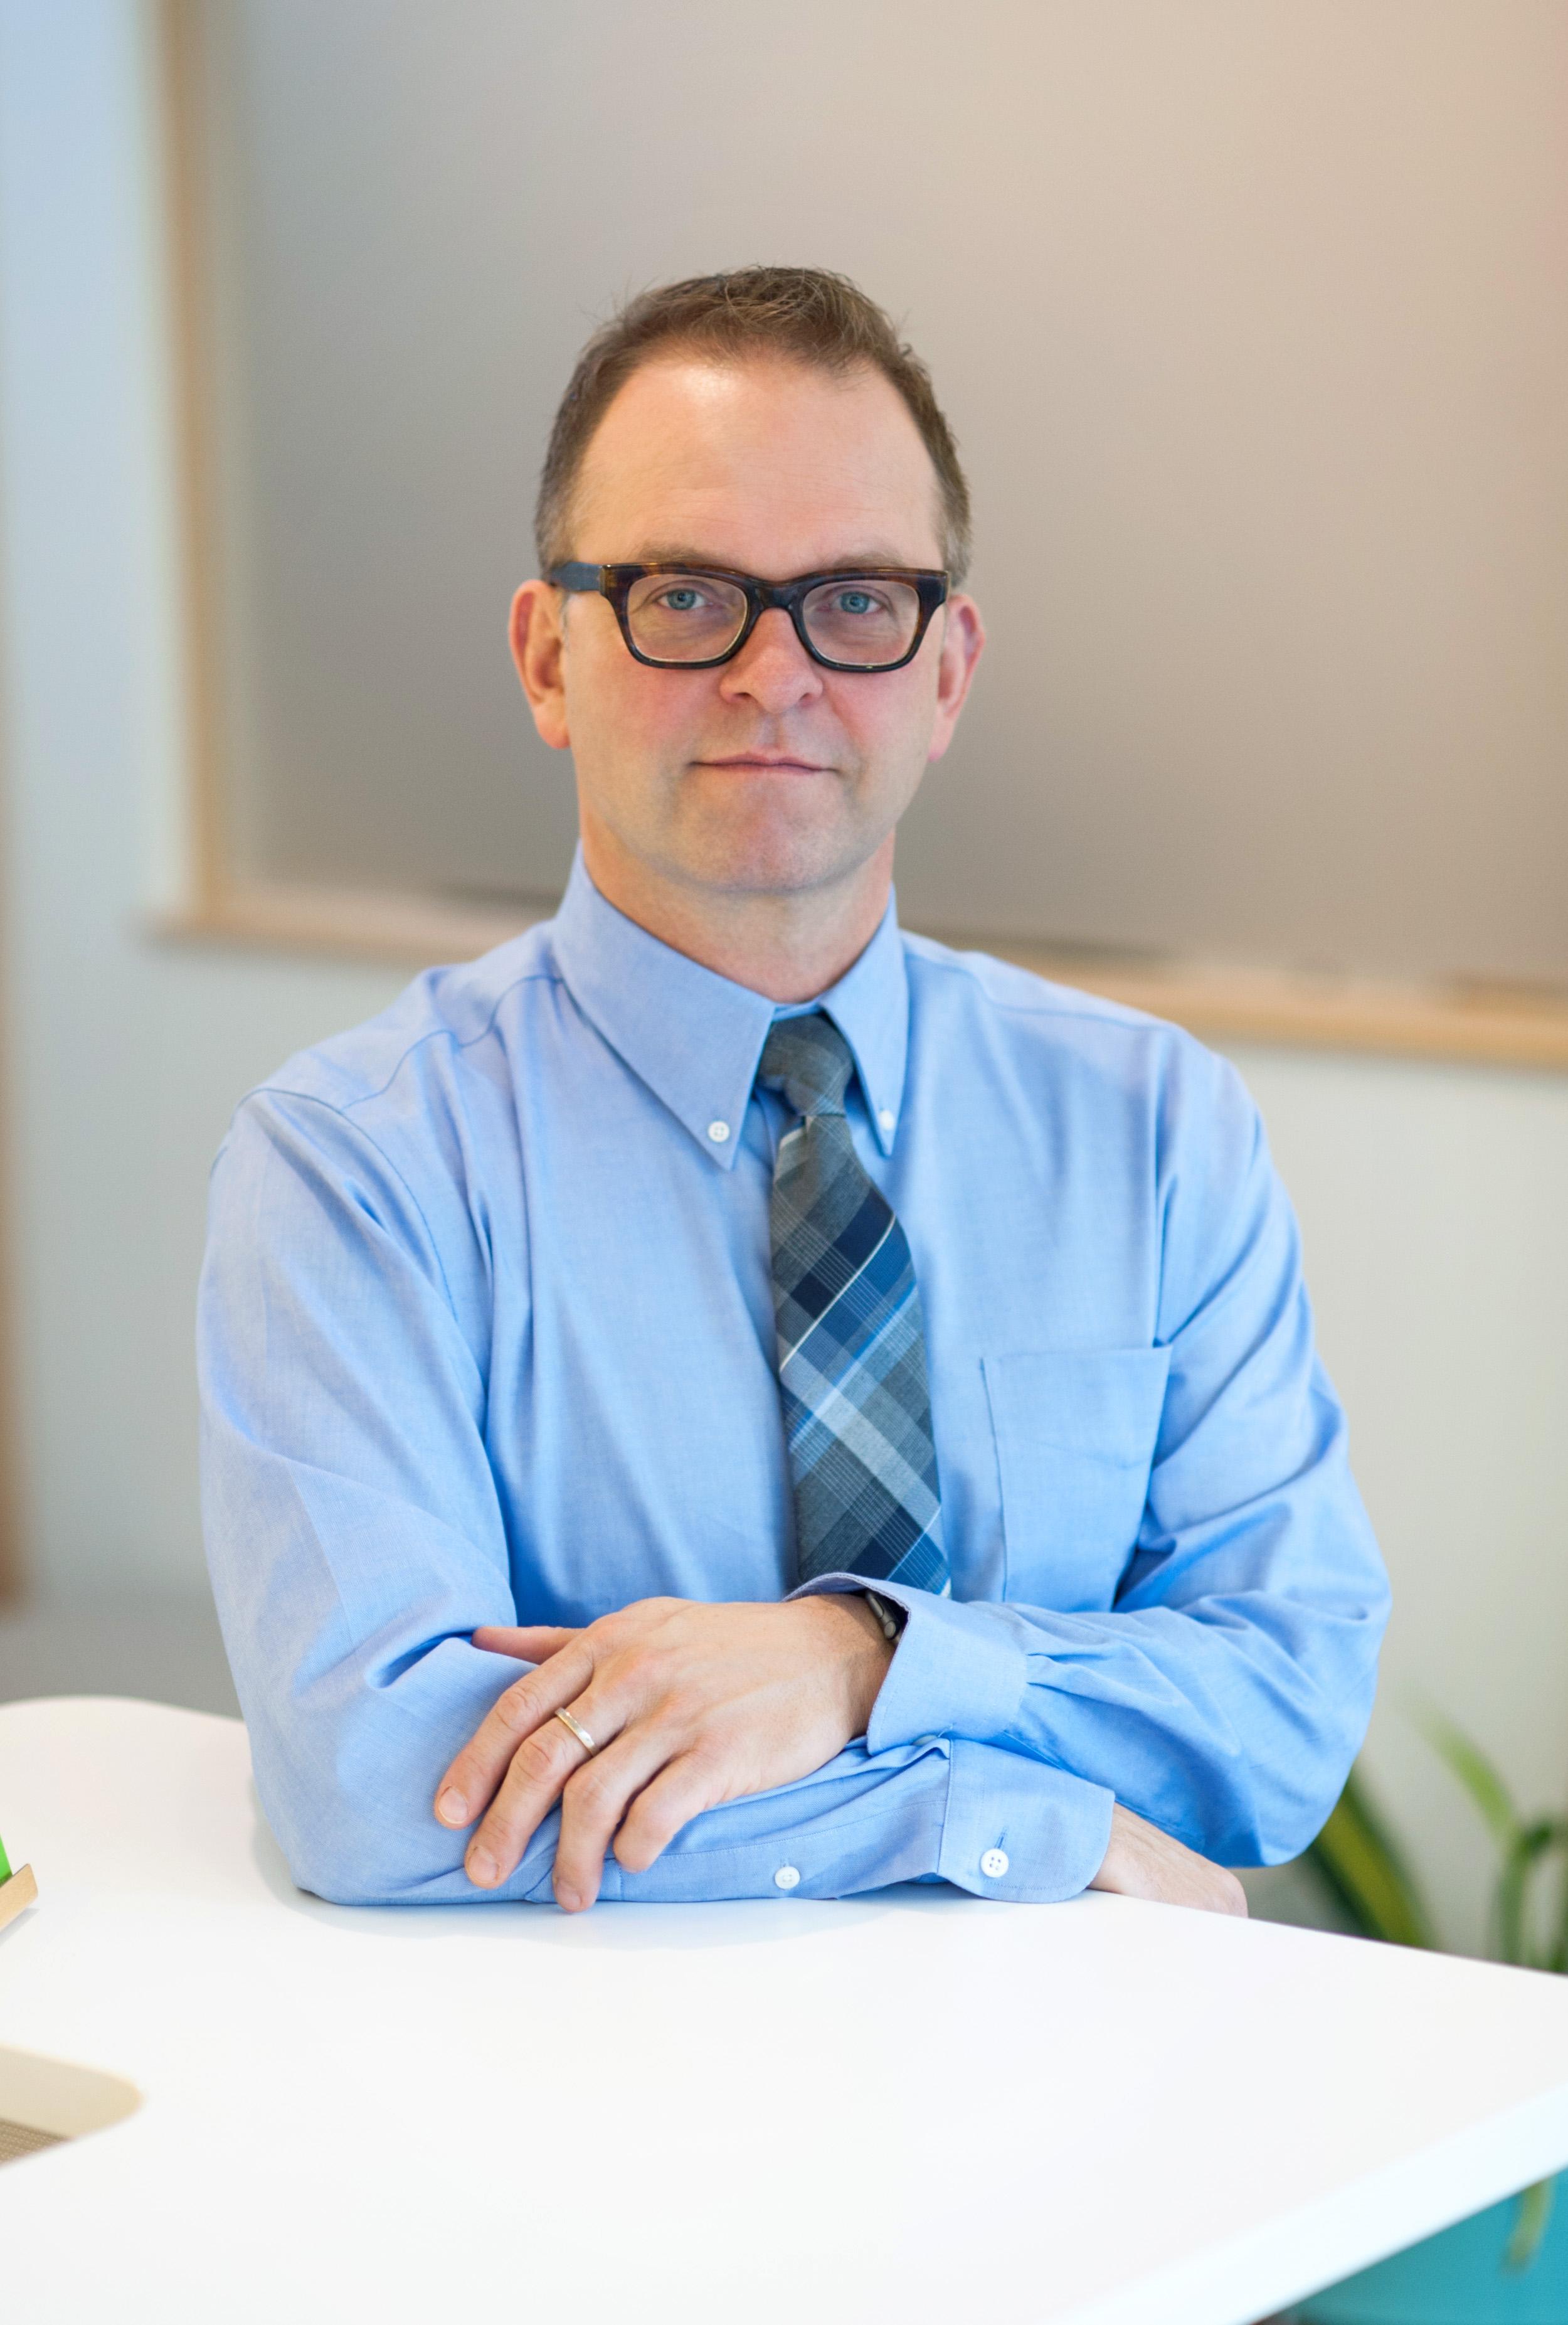 Dr. Chris Bierbrauer, Licensed Chiropractor  View my Curriculum Vitae